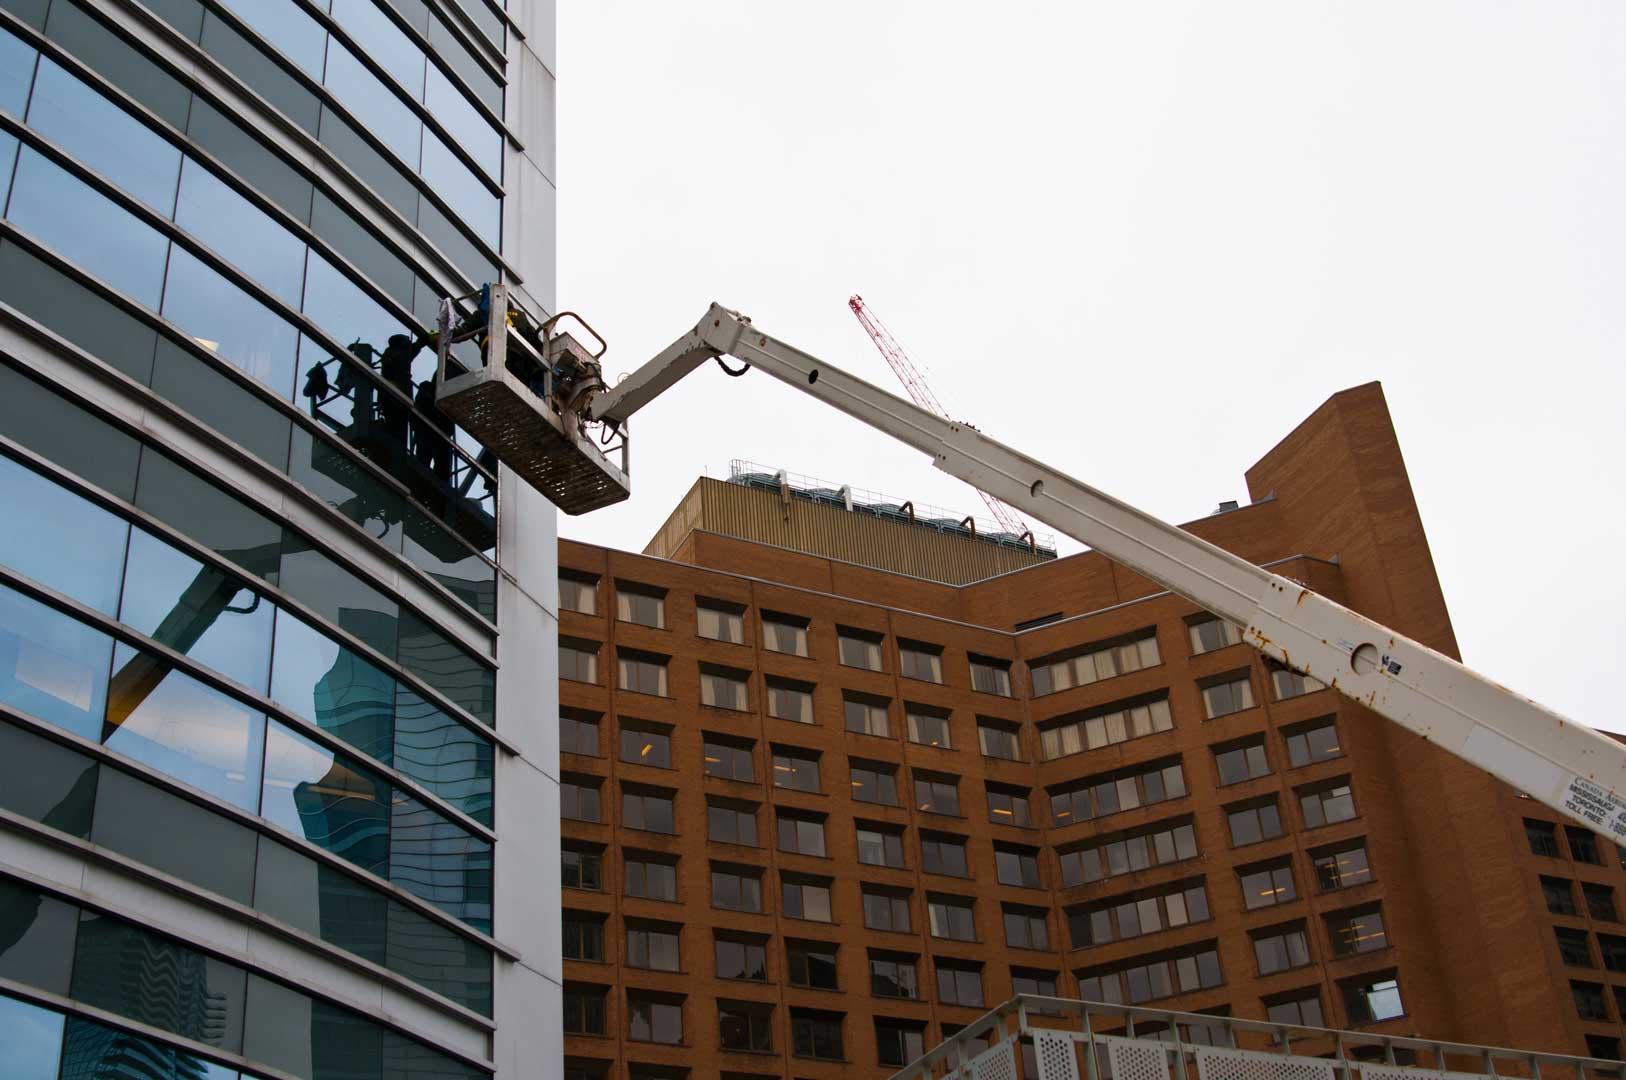 Exterior Facade Maintenance by Explore1.ca with Boom Truck in Toronto Ontario